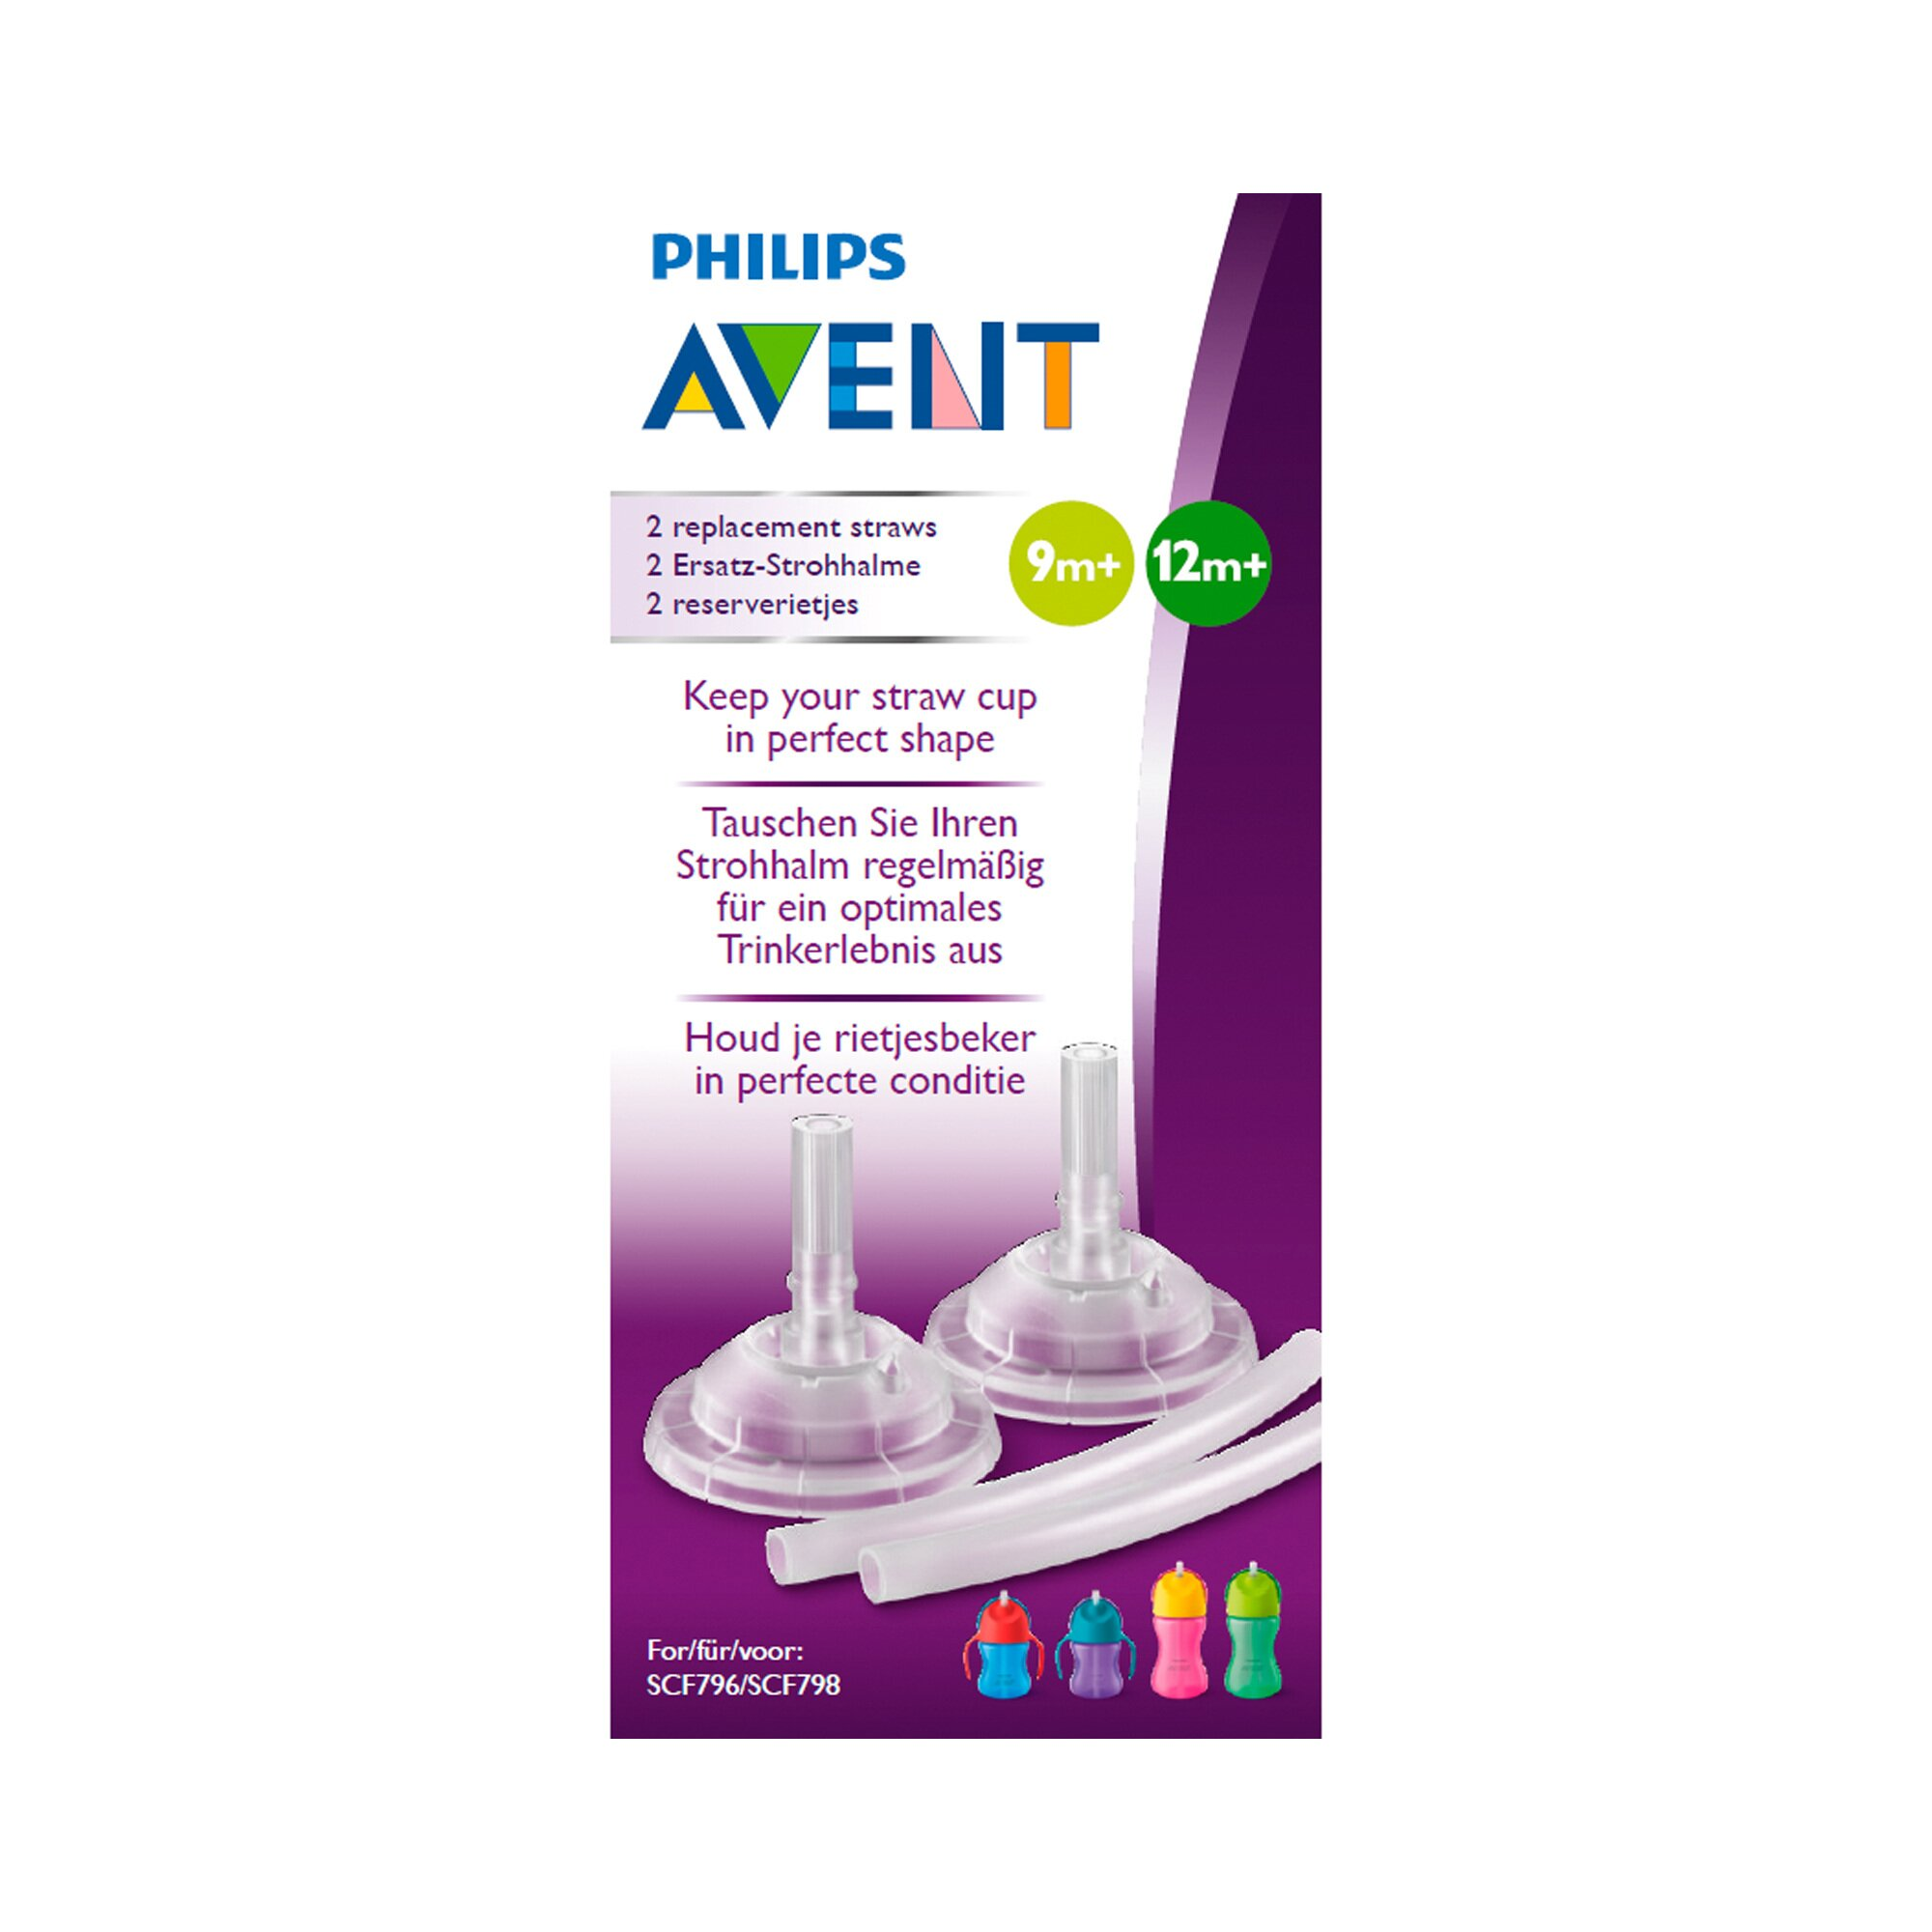 philips-avent-2er-pack-ersatz-strohhalm-scf797-00